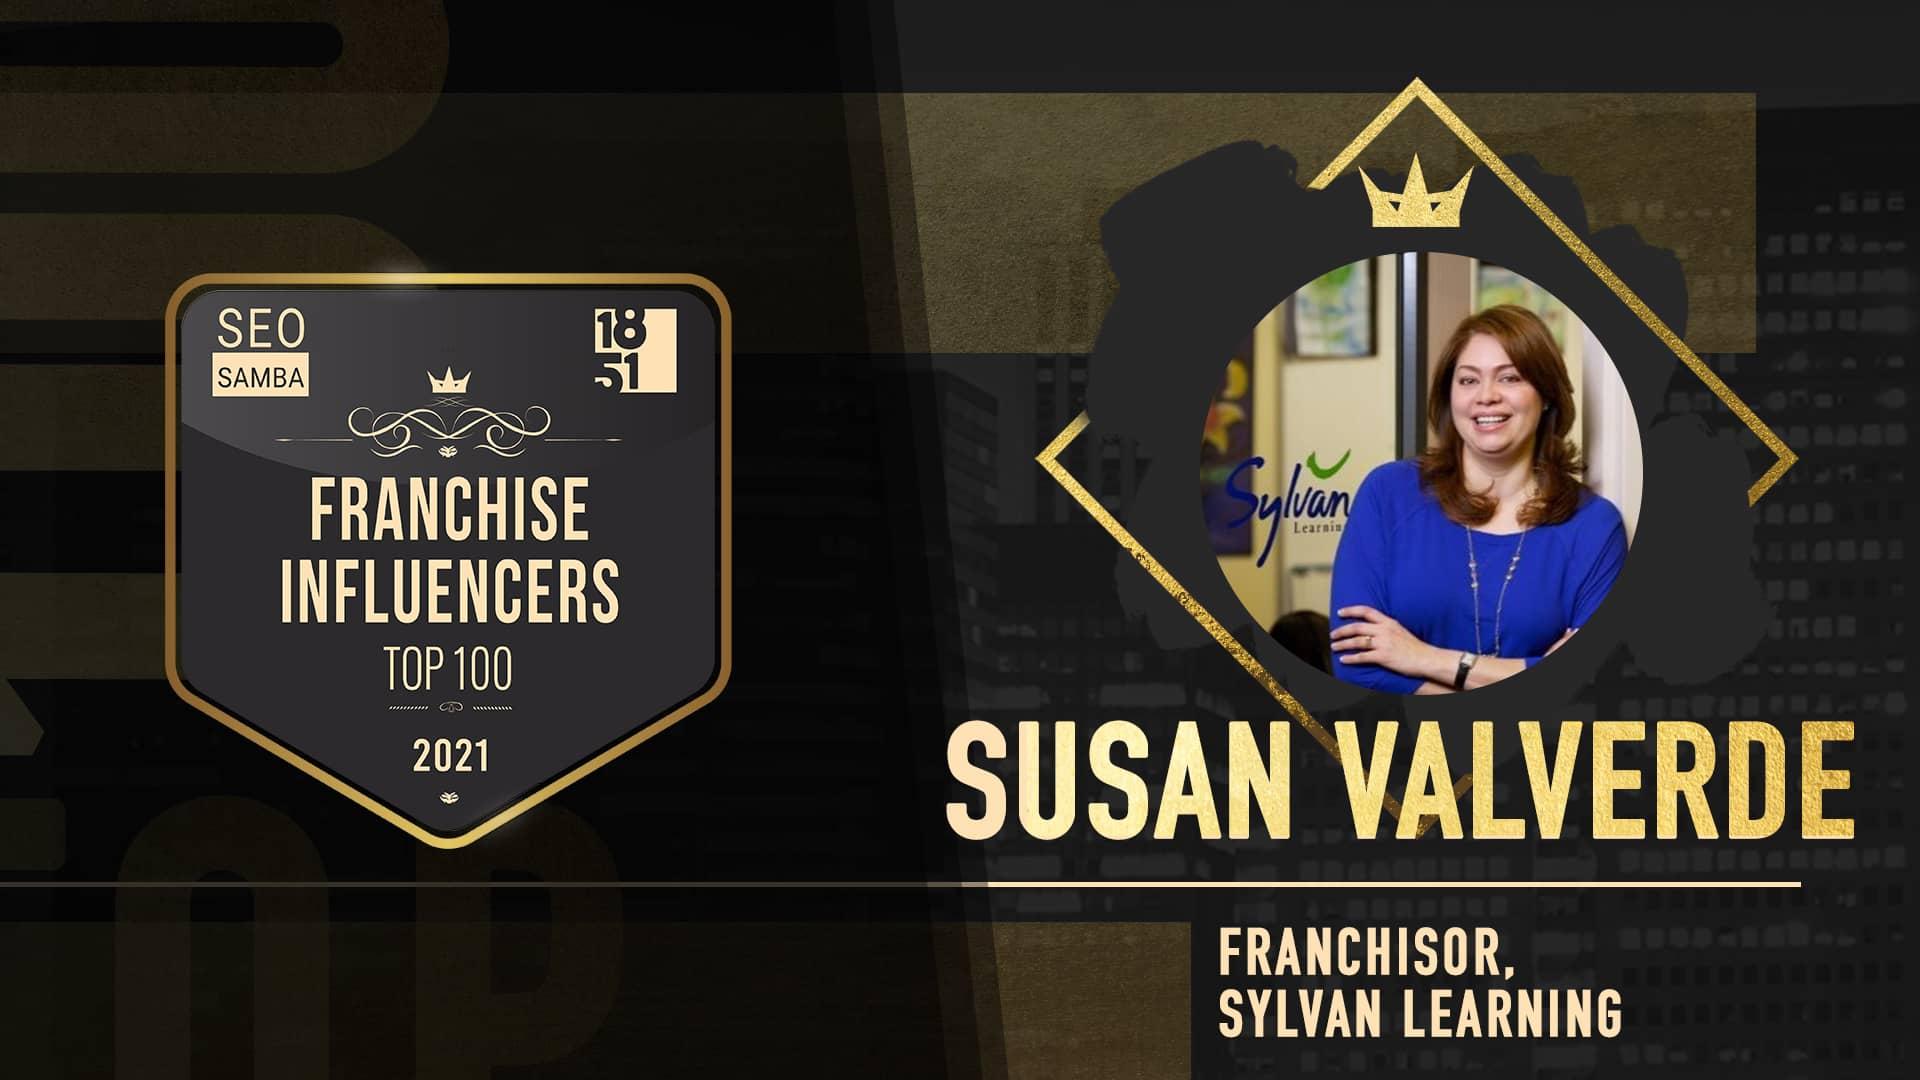 Susan Valverde - Sylvan Learning*